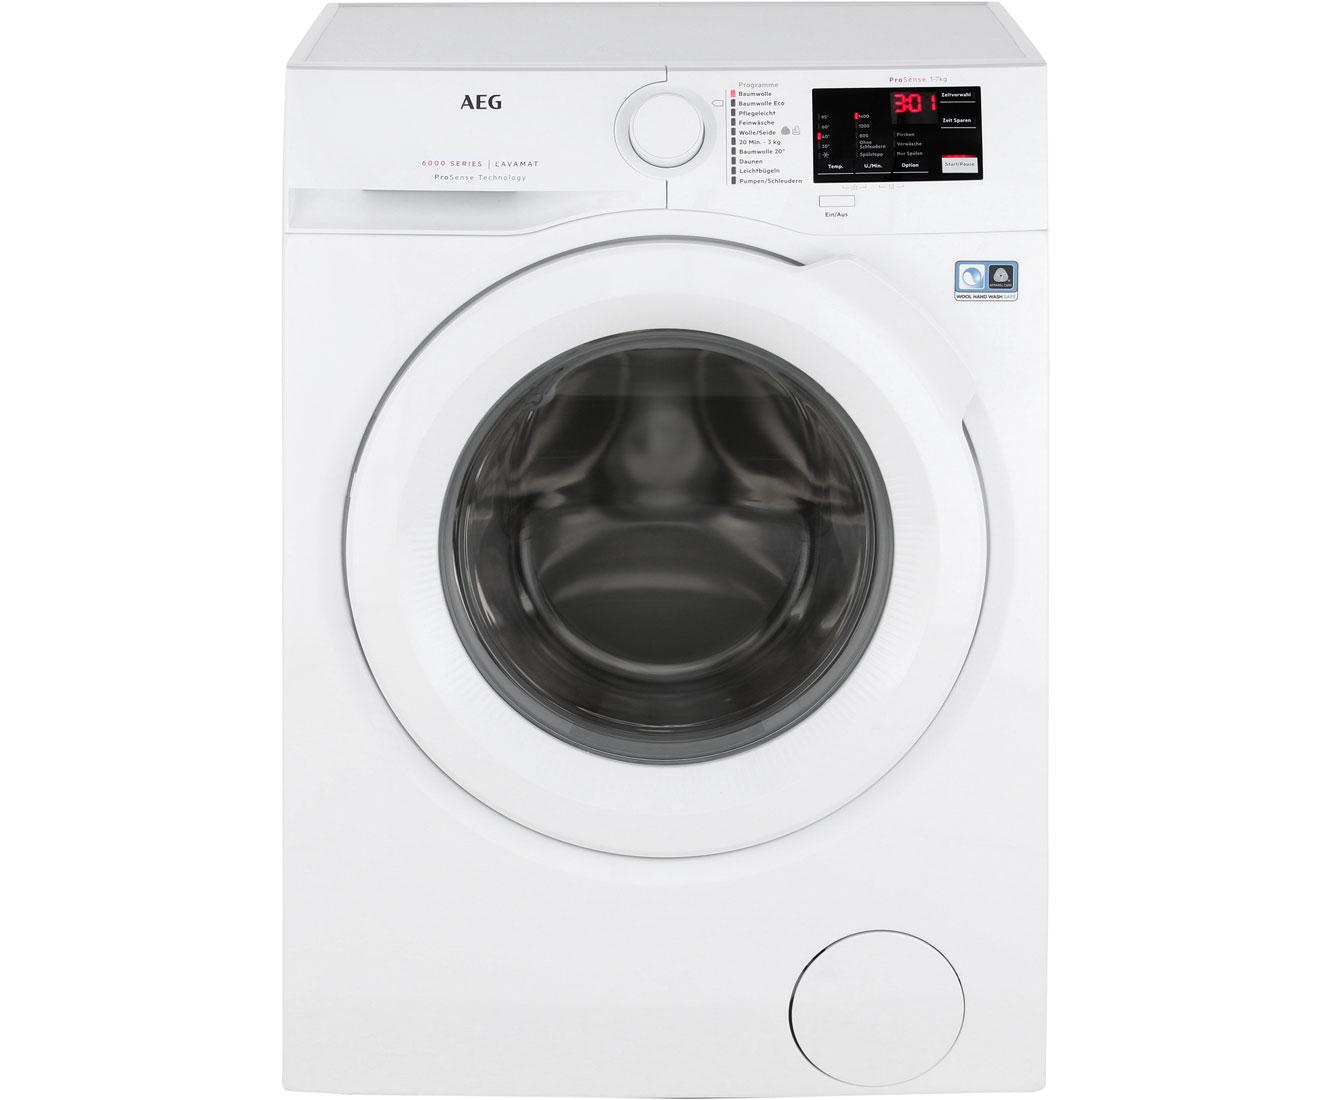 Aeg Lavamat L6fb50470 Waschmaschine Weiß 7 Kg 1400 Umin A